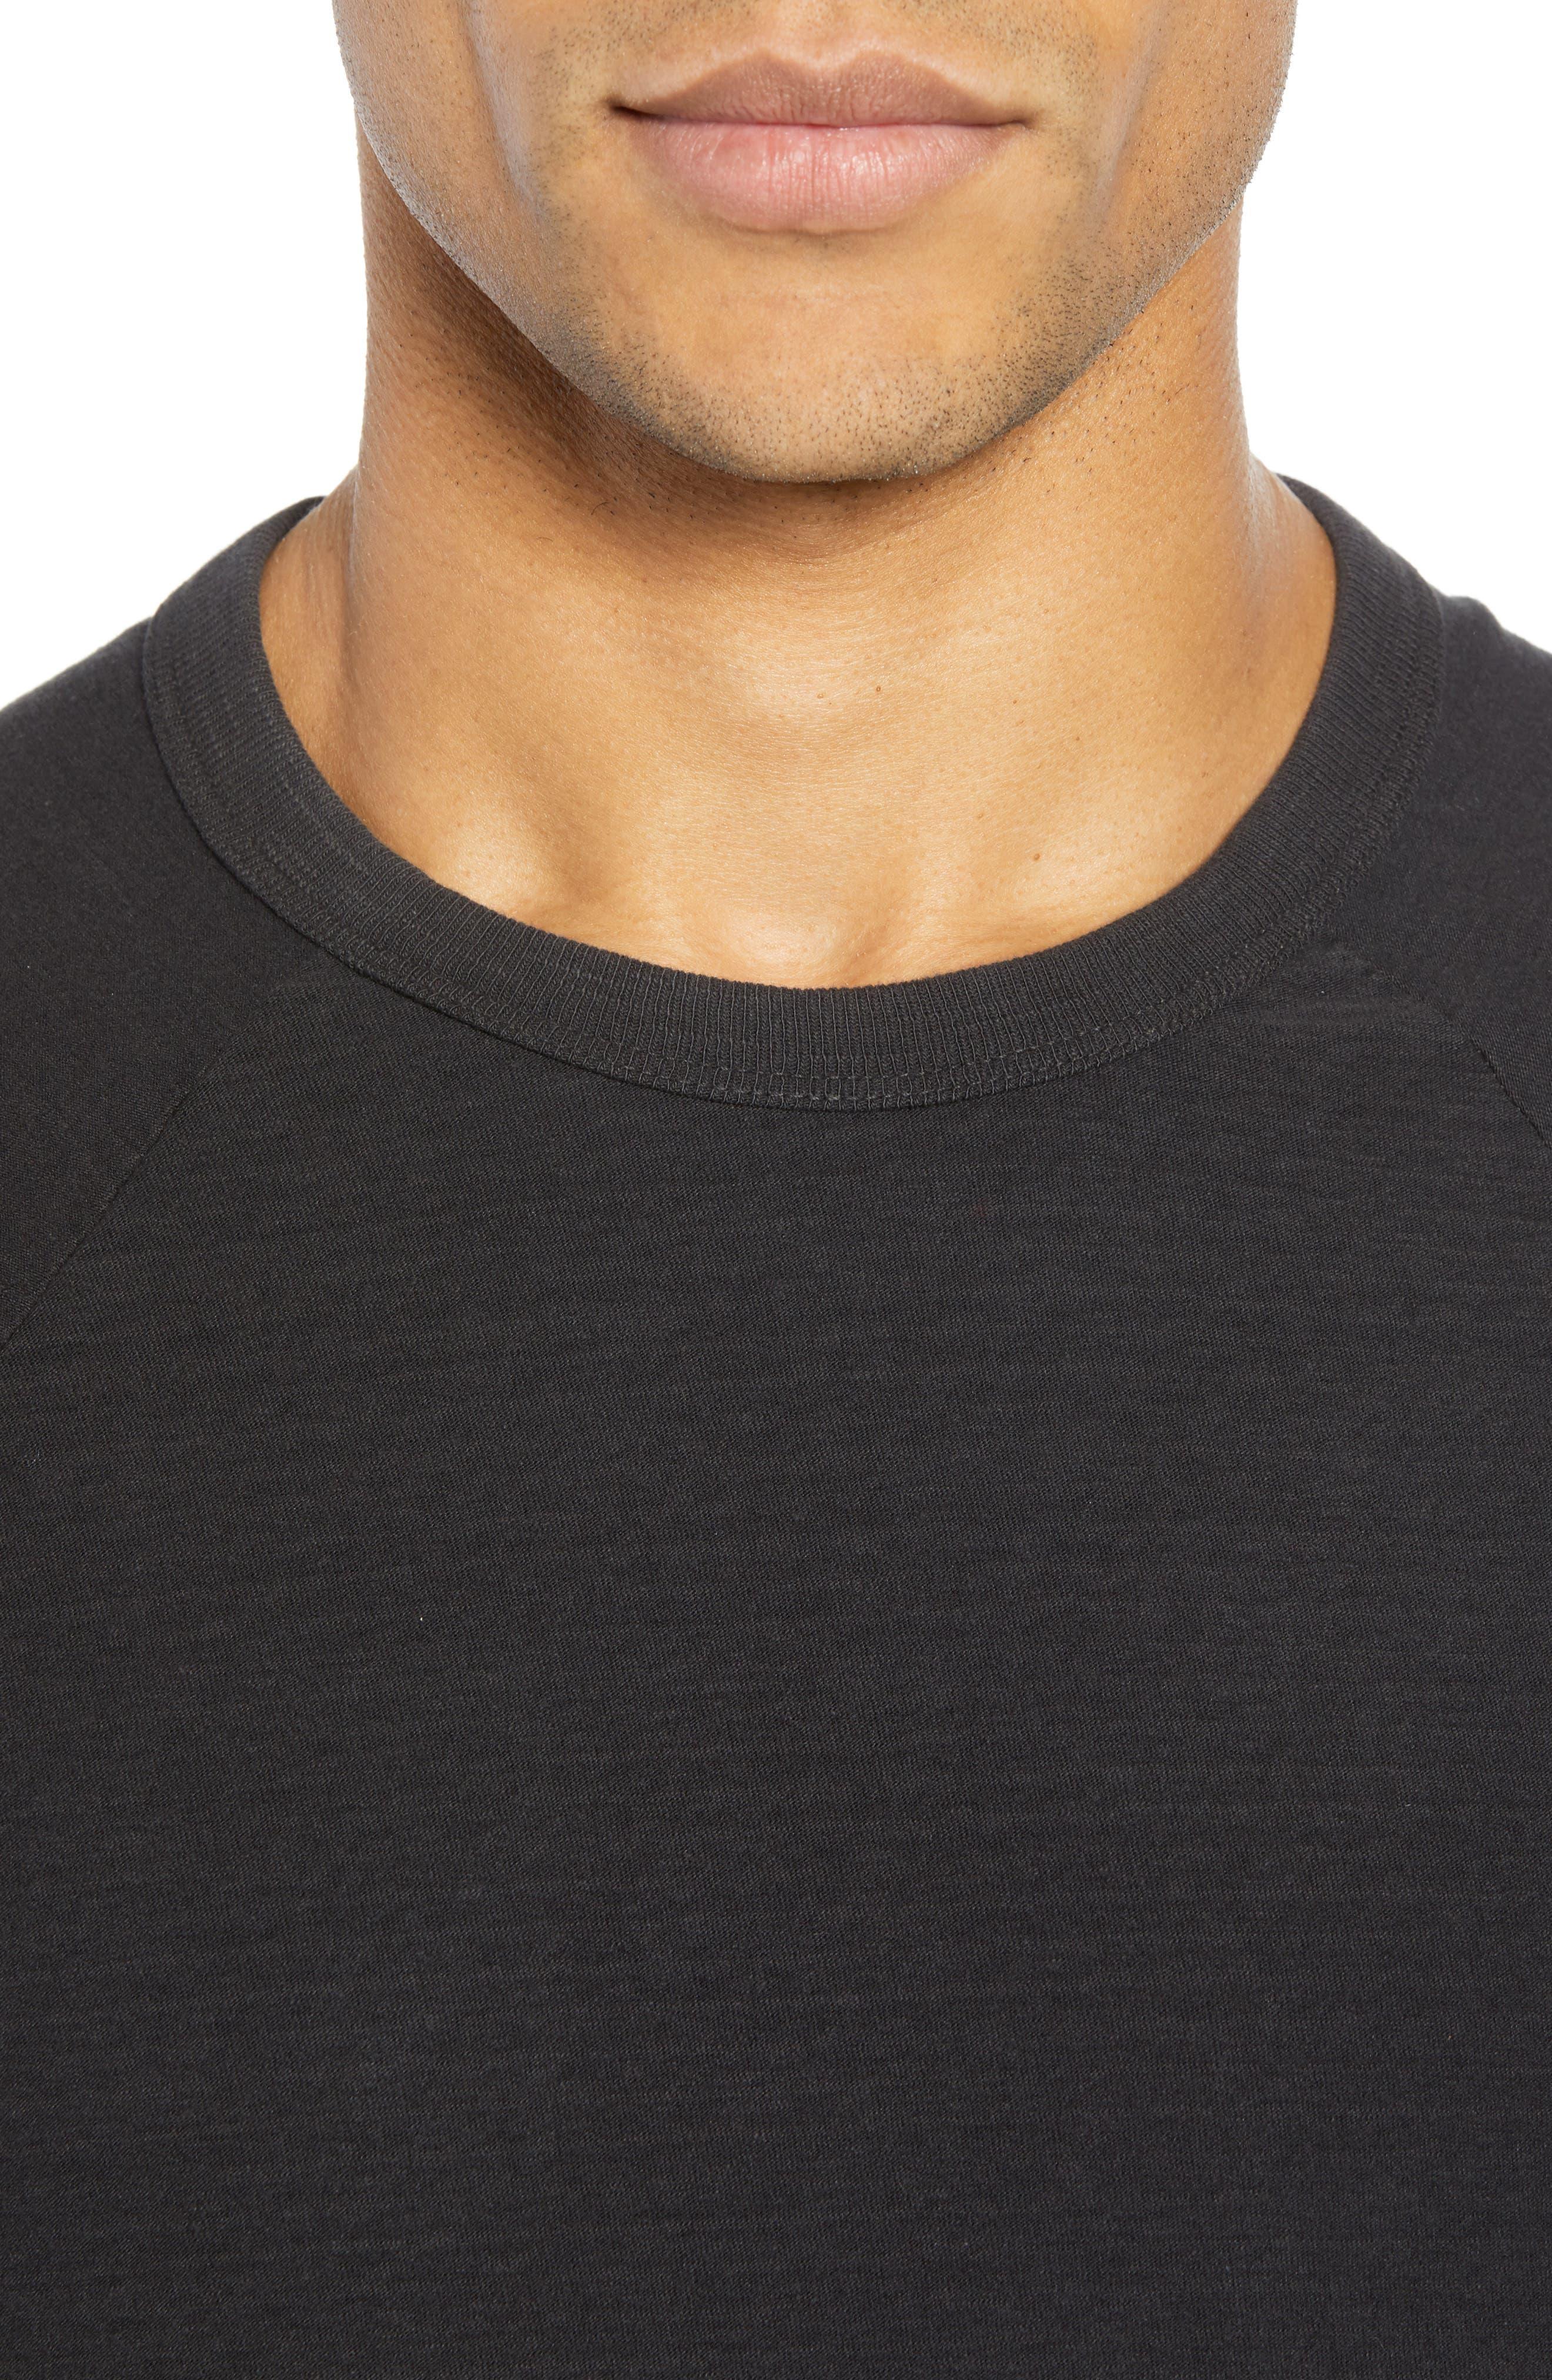 Microstripe Long Sleeve Raglan T-Shirt,                             Alternate thumbnail 4, color,                             CARBON